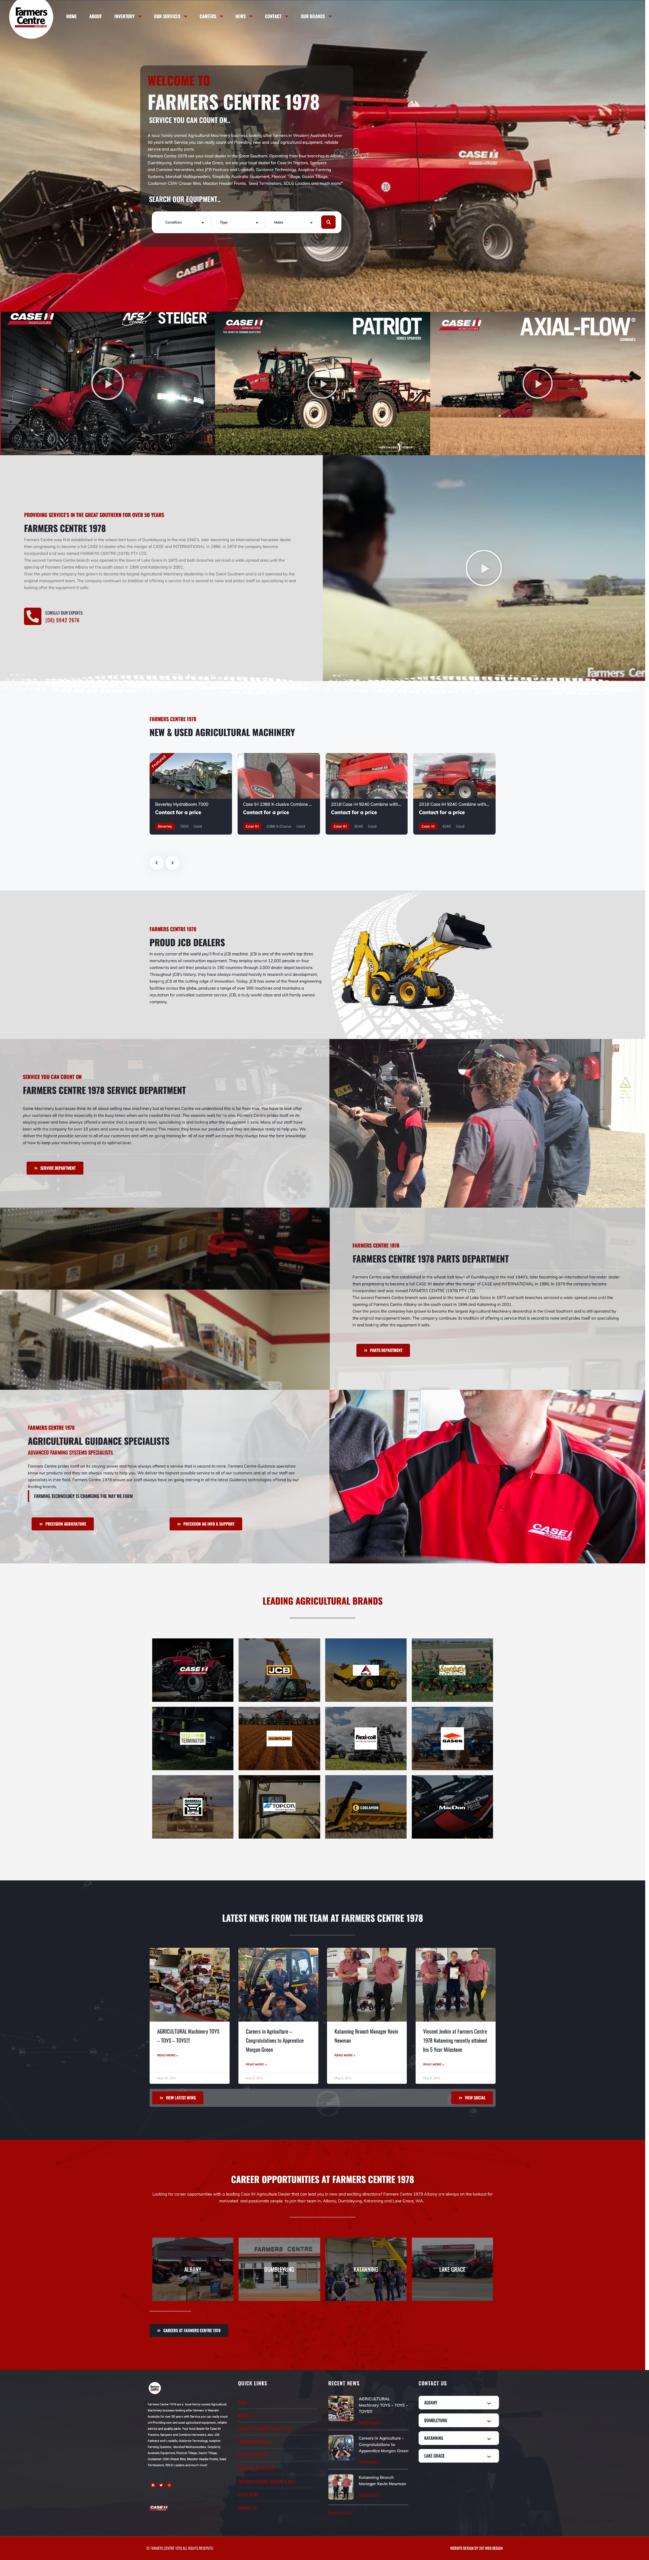 Farm Machinery Dealer Websites Case IH